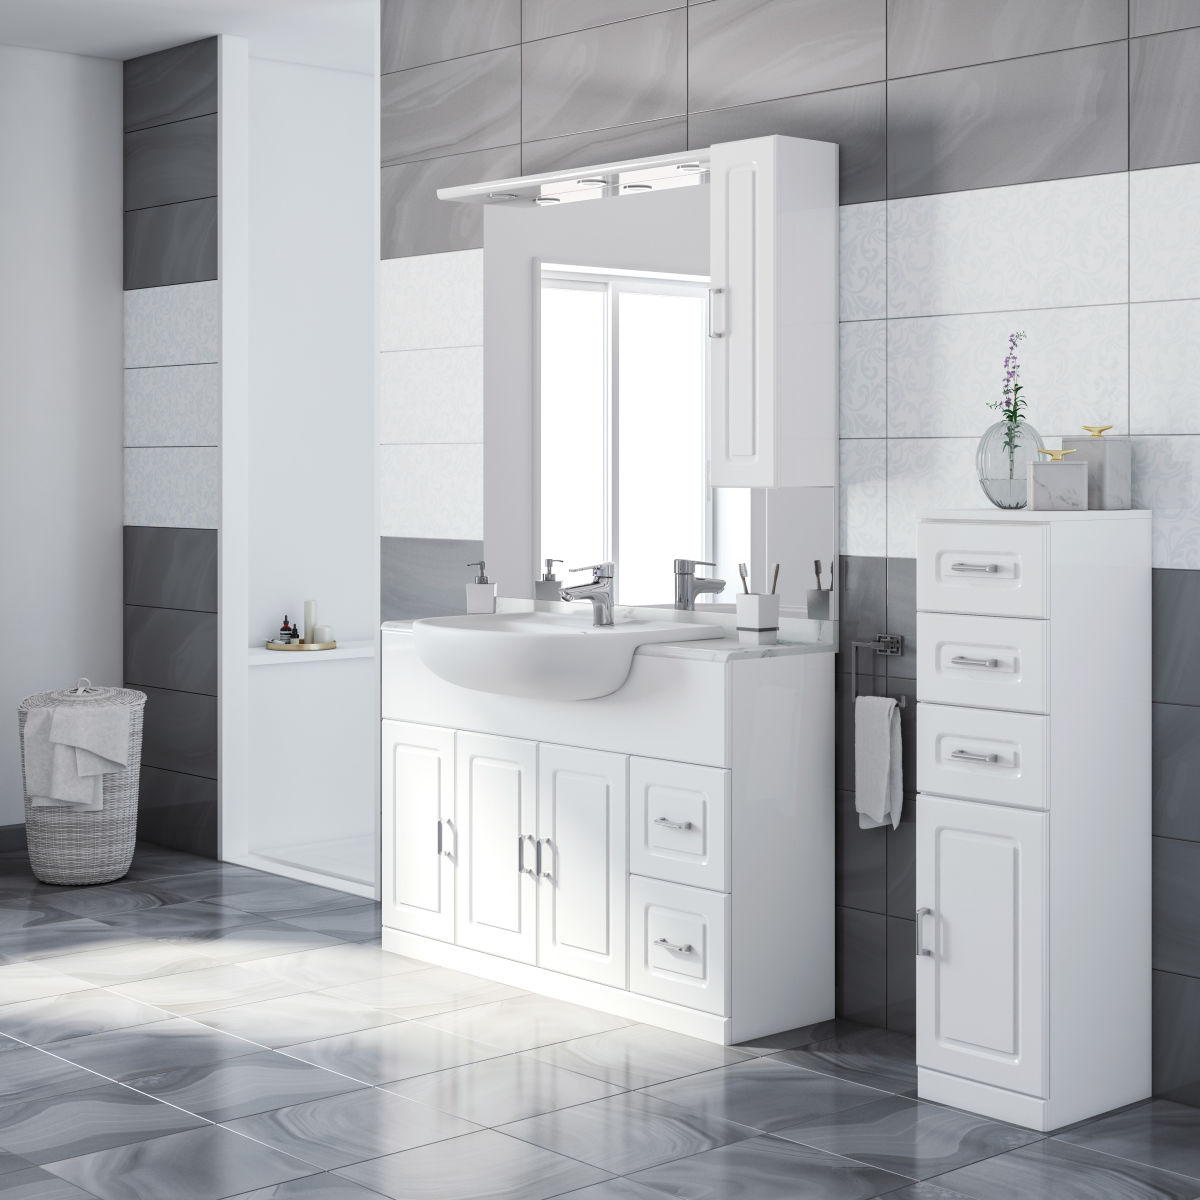 Mobile bagno paola bianco l 120 cm prezzi e offerte online - Mobili bagni leroy merlin ...